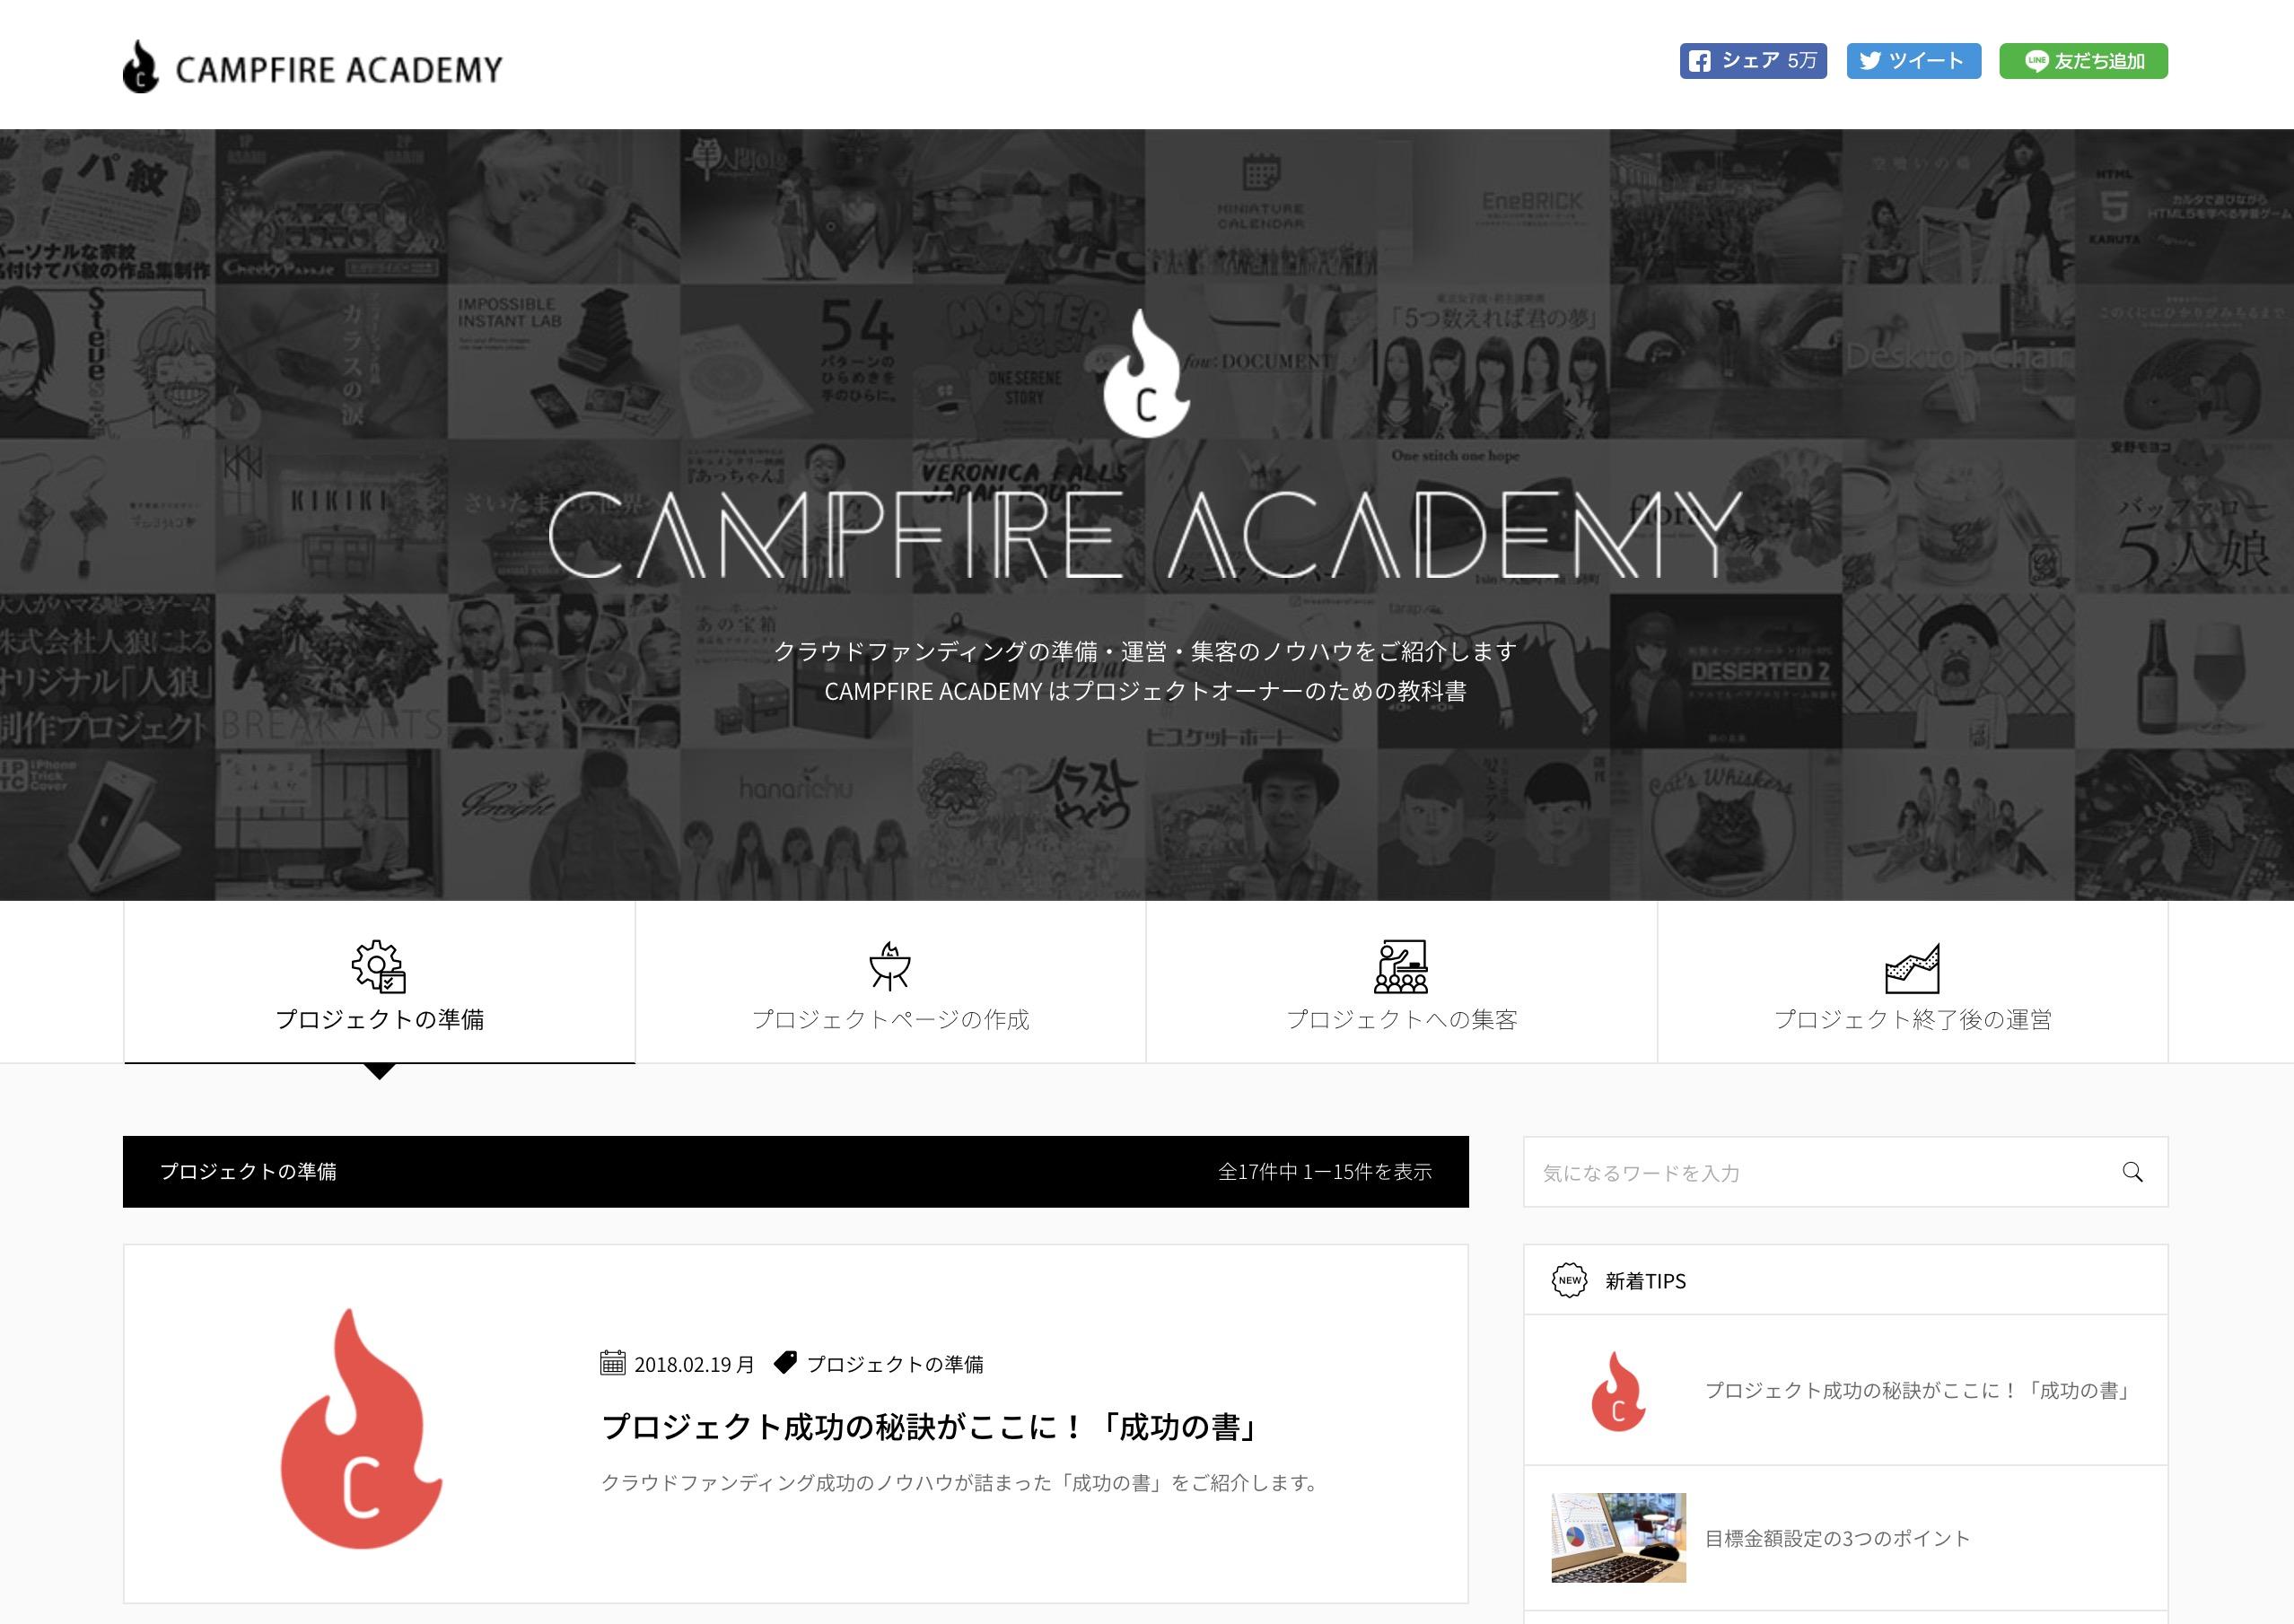 CAMPFIRE ACADEMY(キャンプファイヤーアカデミー)